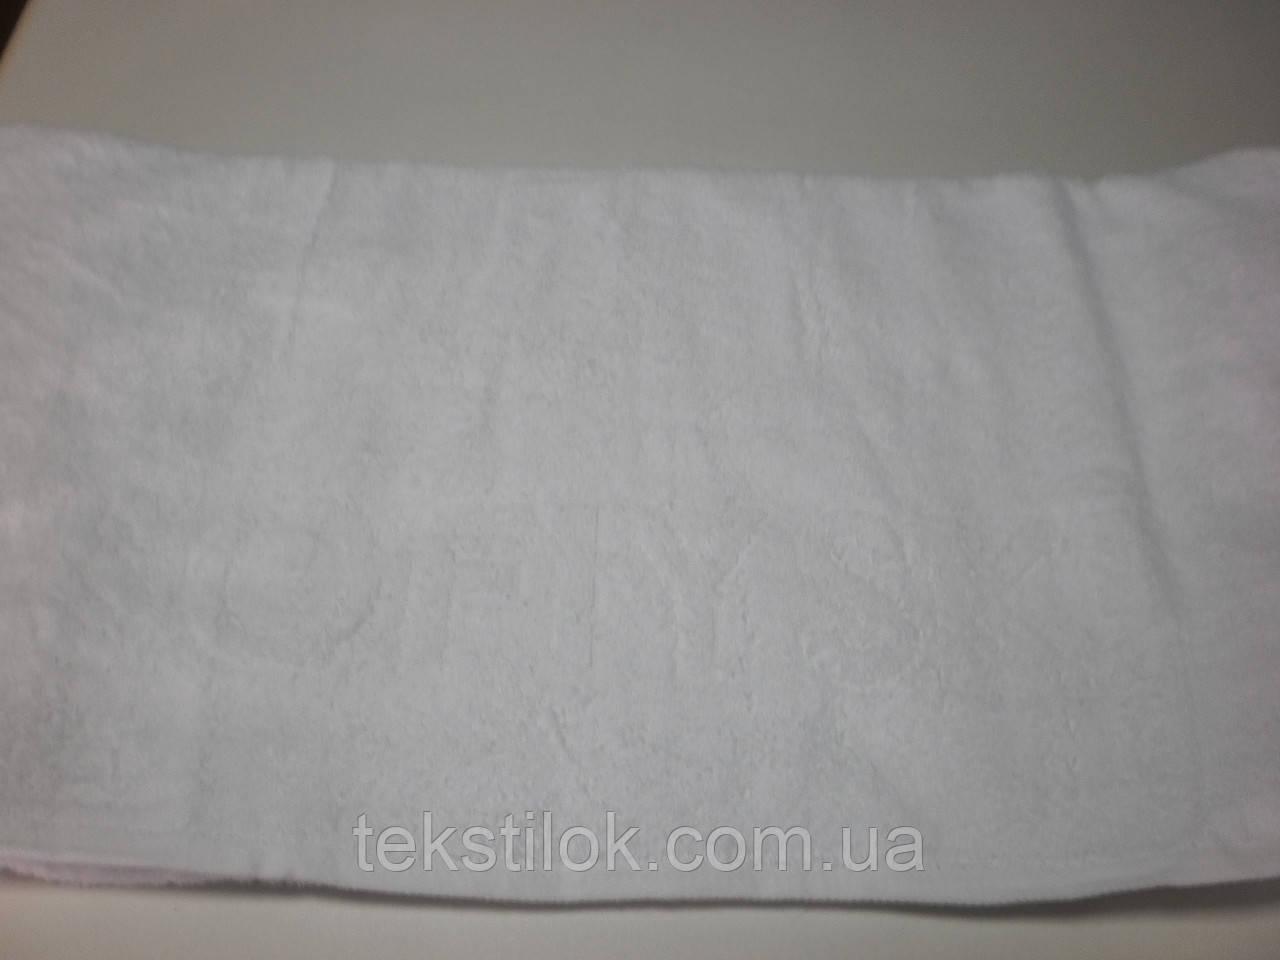 Полотенце белое лого жекарт